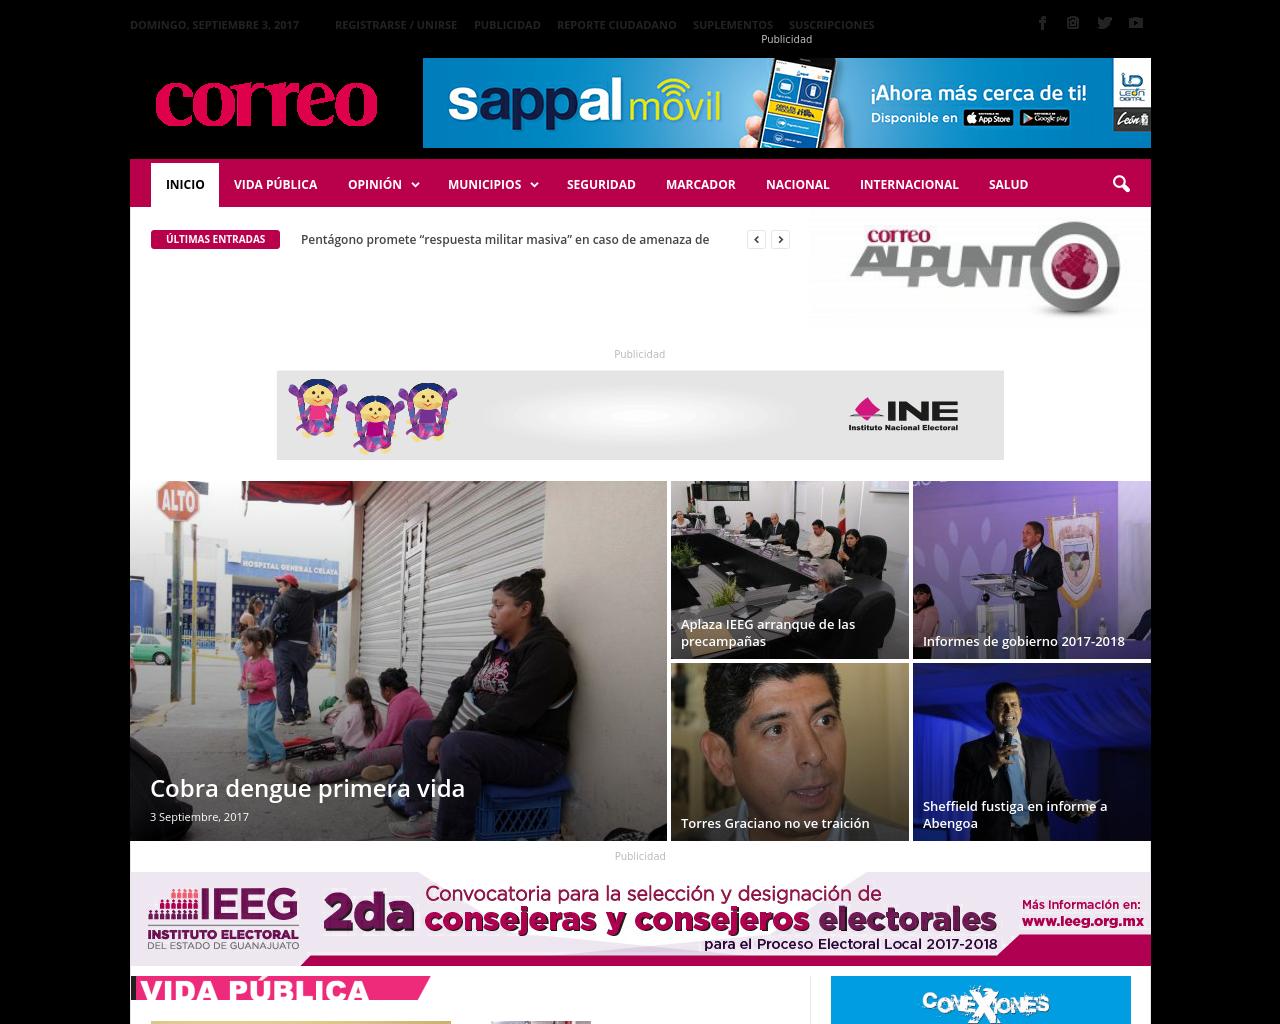 Periodico-Correo-(Newspaper-Mail)-Advertising-Reviews-Pricing